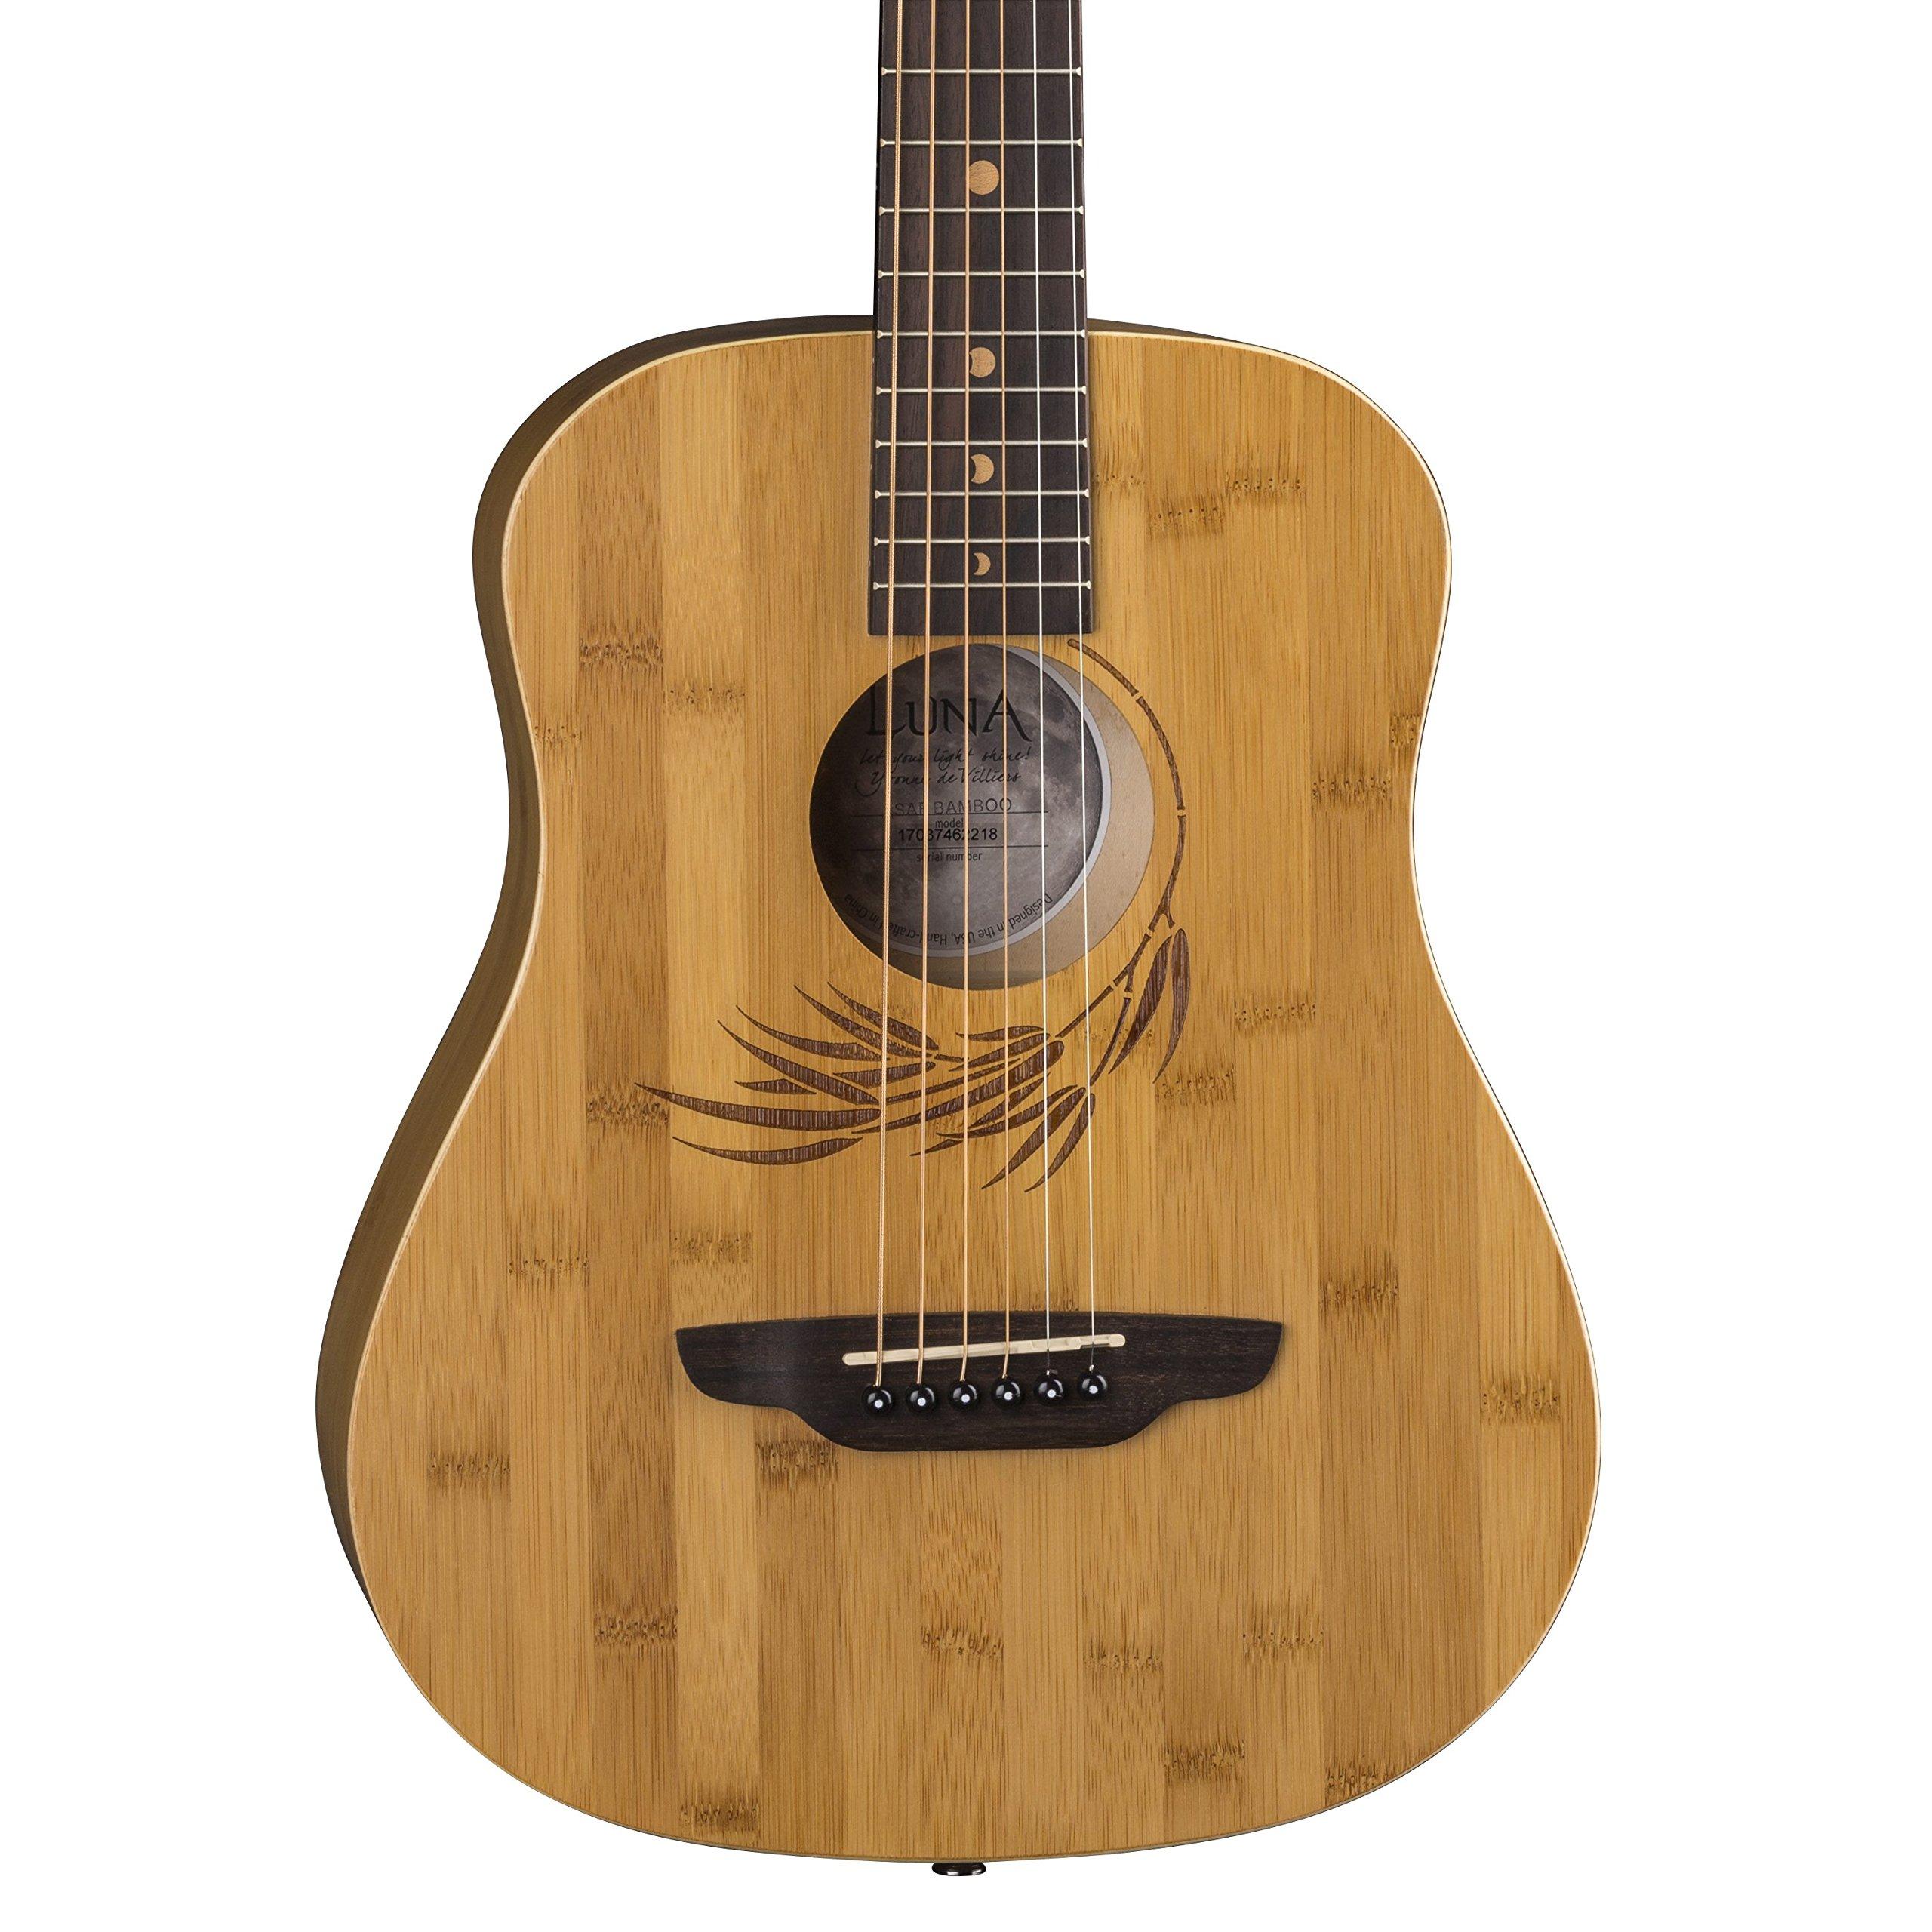 Luna Safari Bamboo Acoustic Travel Guitar with Gig Bag, Satin Natural by Luna Guitars